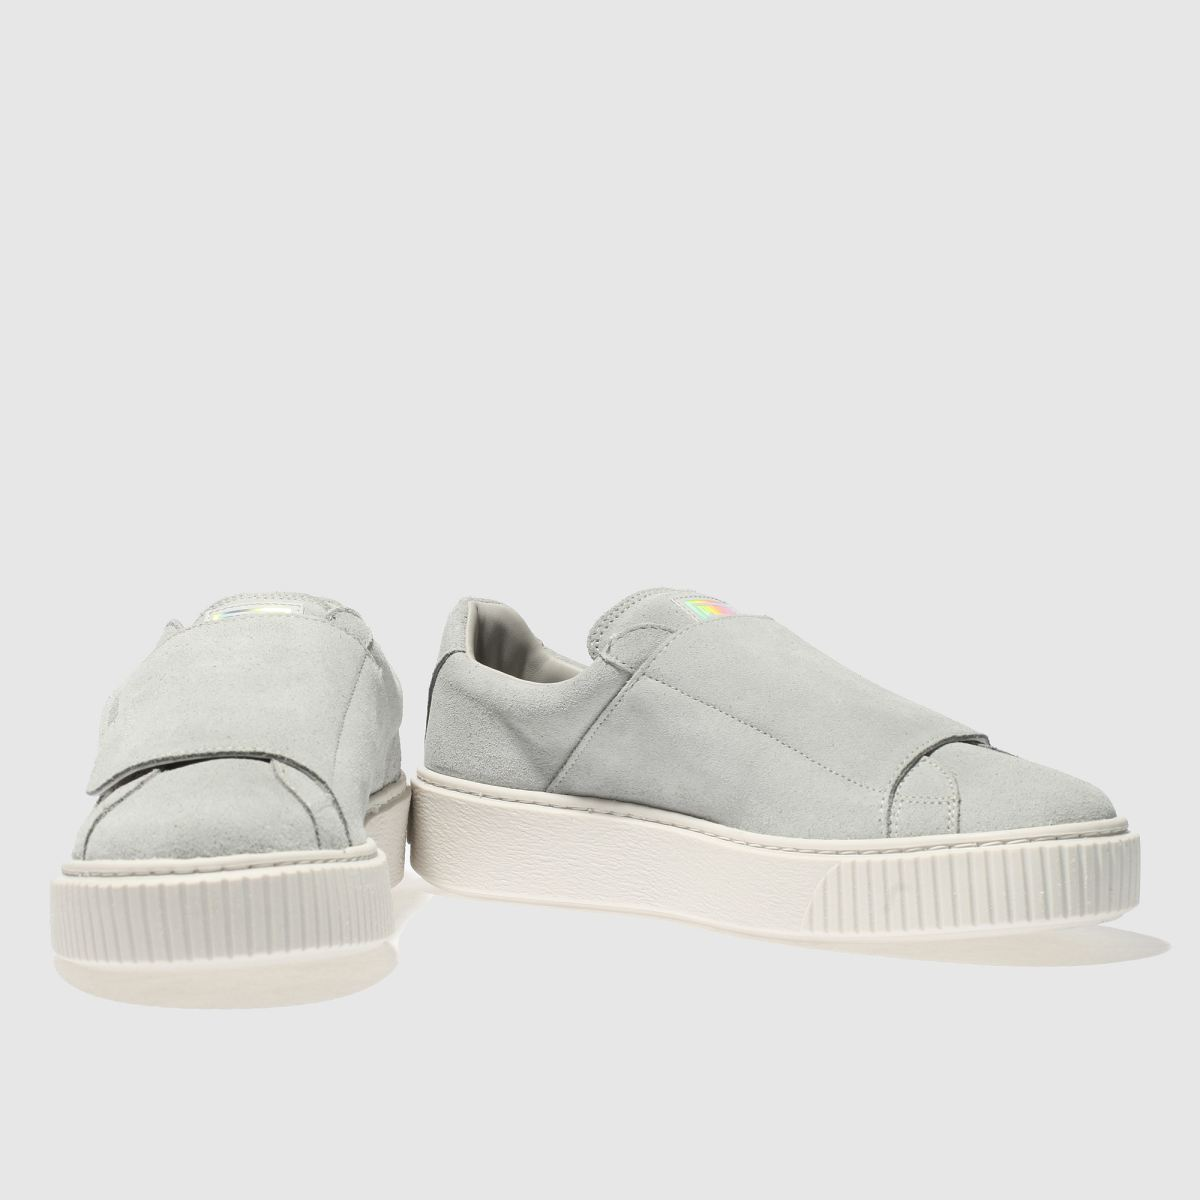 Damen Grau puma Platform Gute Strap Sneaker | schuh Gute Platform Qualität beliebte Schuhe 9a1c6f